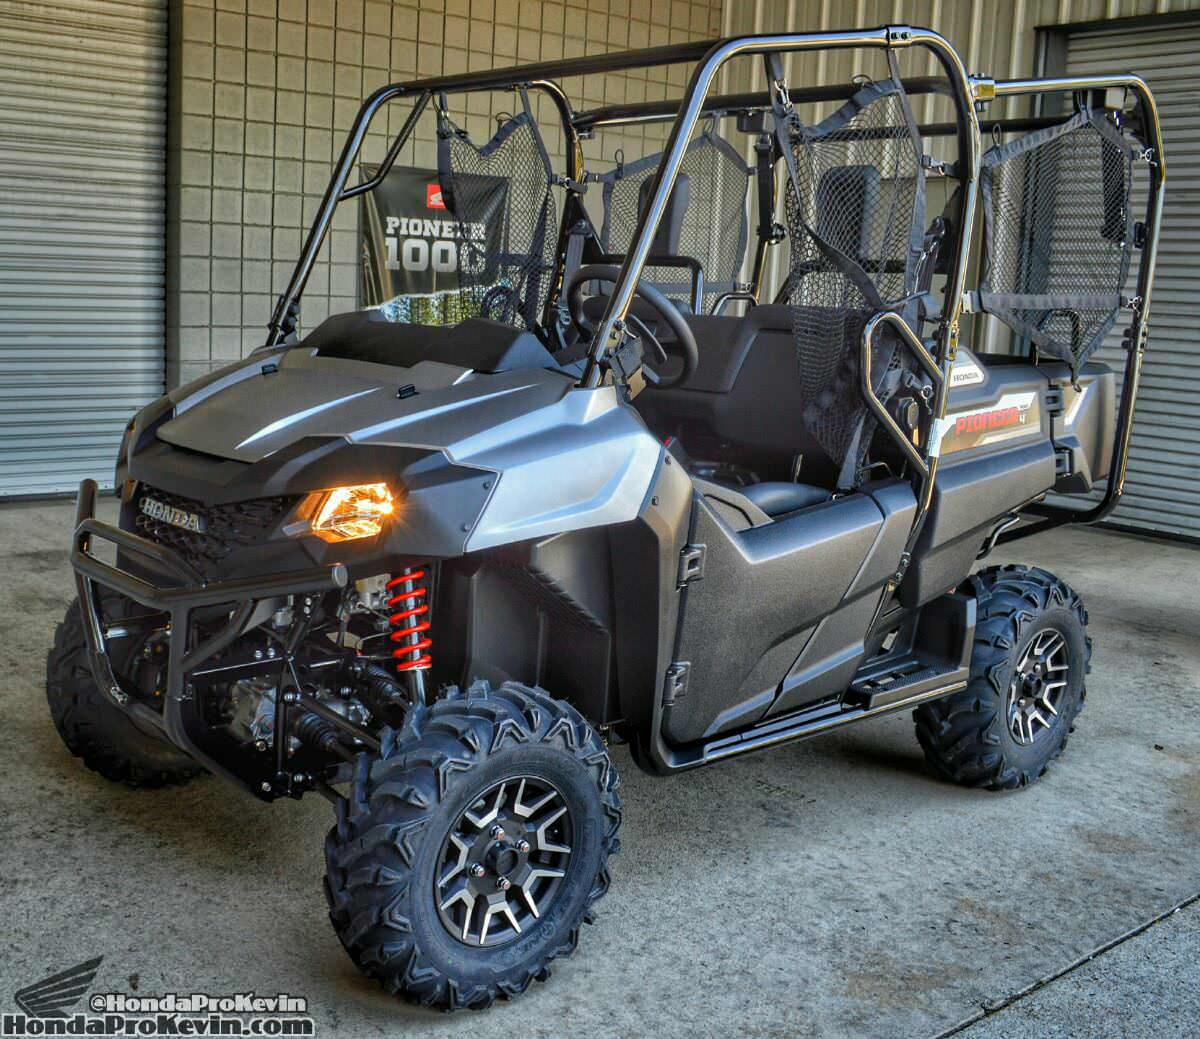 2017 Honda Pioneer 700-4 Deluxe Review / Specs - UTV / Side by Side ATV / SxS Utility Vehicle 4x4 - Matte Silver Metallic SXS700 / SXS700M4